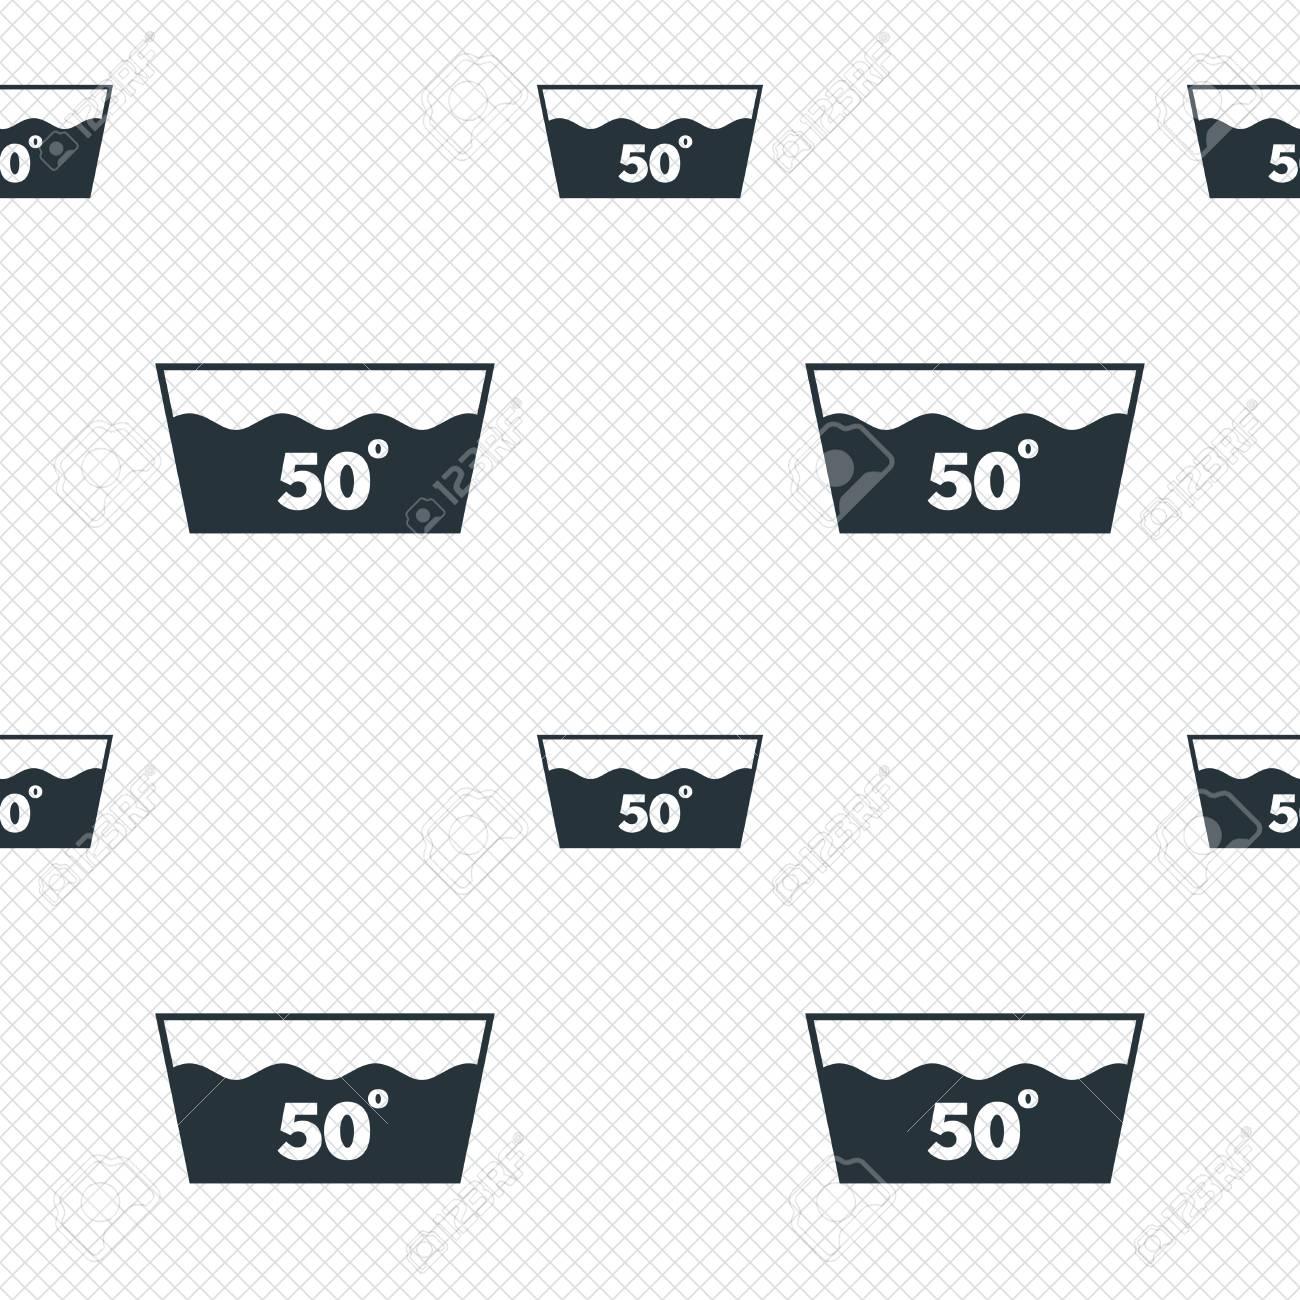 Wash Icon Machine Washable At 50 Degrees Symbol Seamless Grid